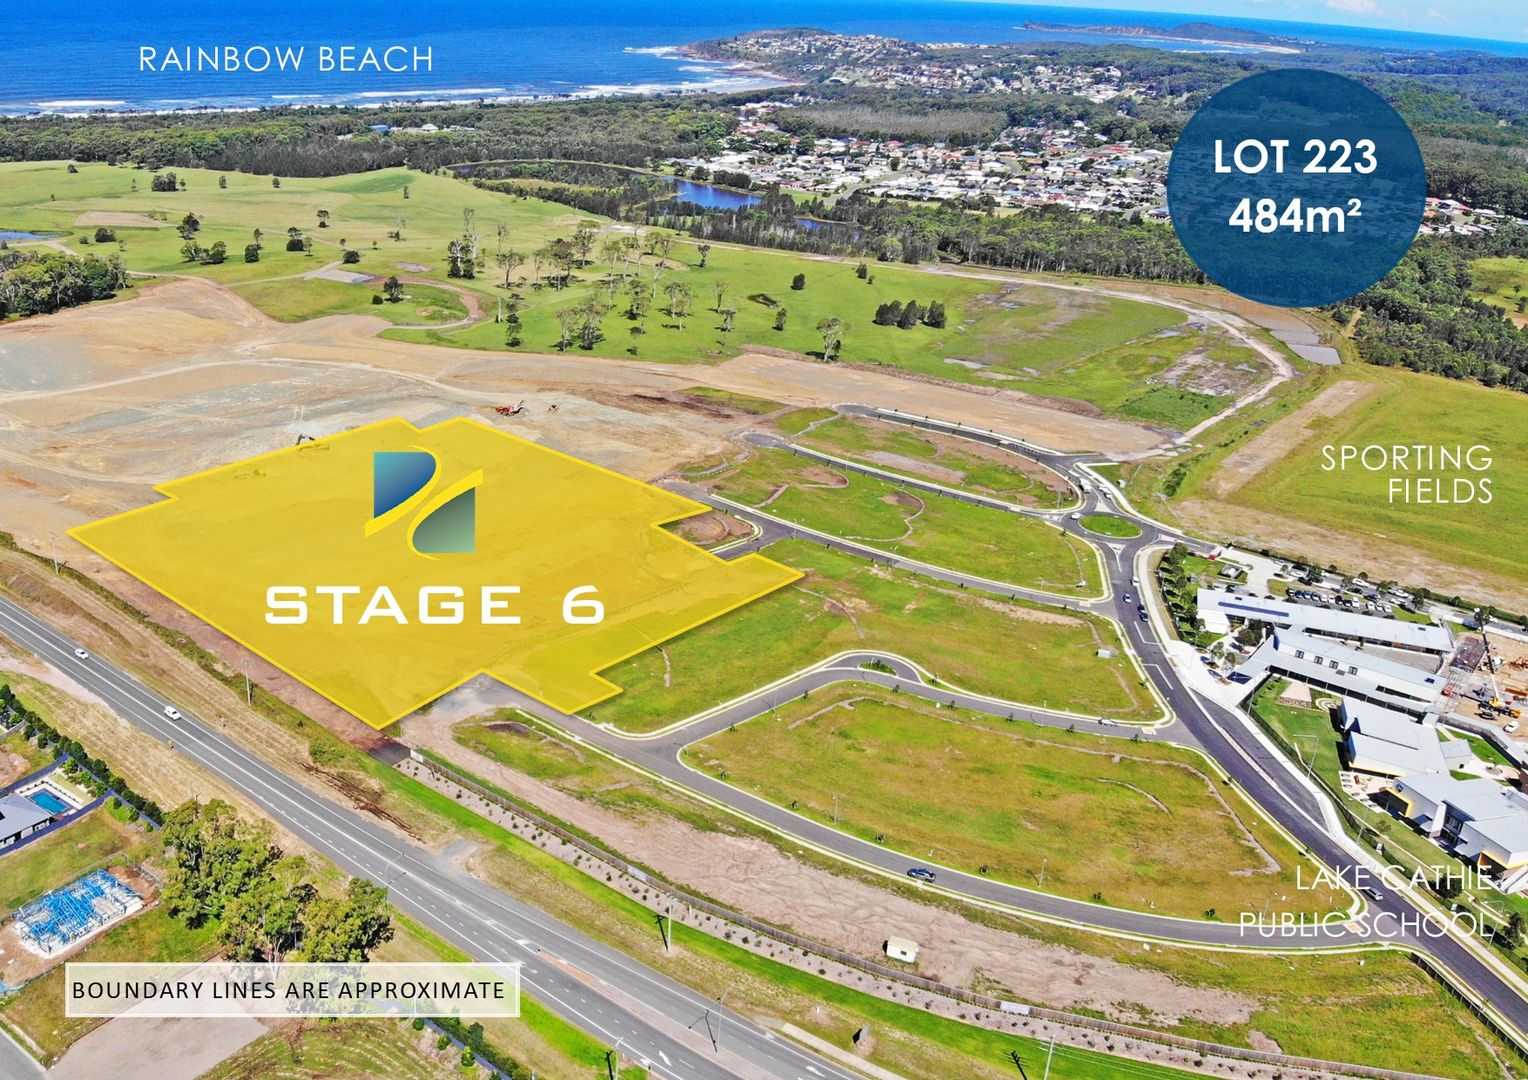 Lot 223 - Rainbow Beach Estate, Lake Cathie NSW 2445, Image 0